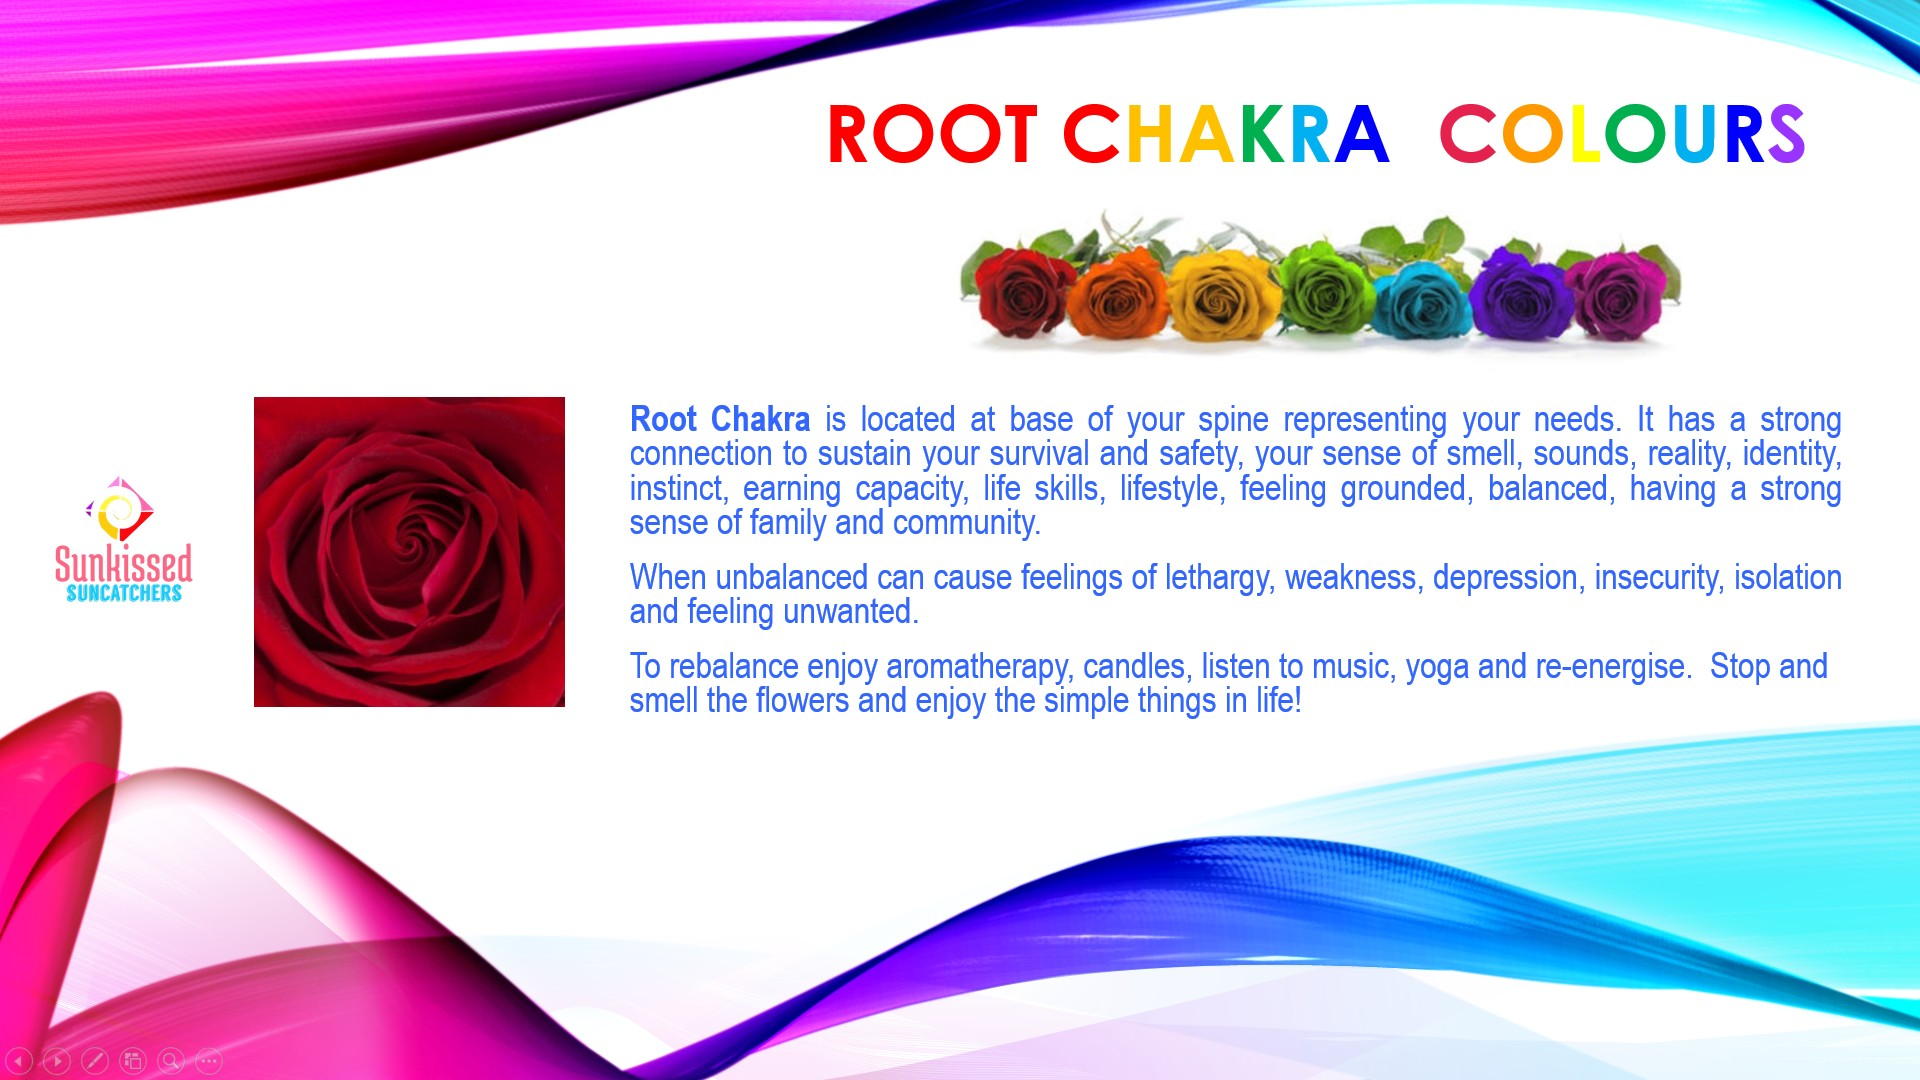 Sunkissed Suncatchers 2 Root Chakra Colours